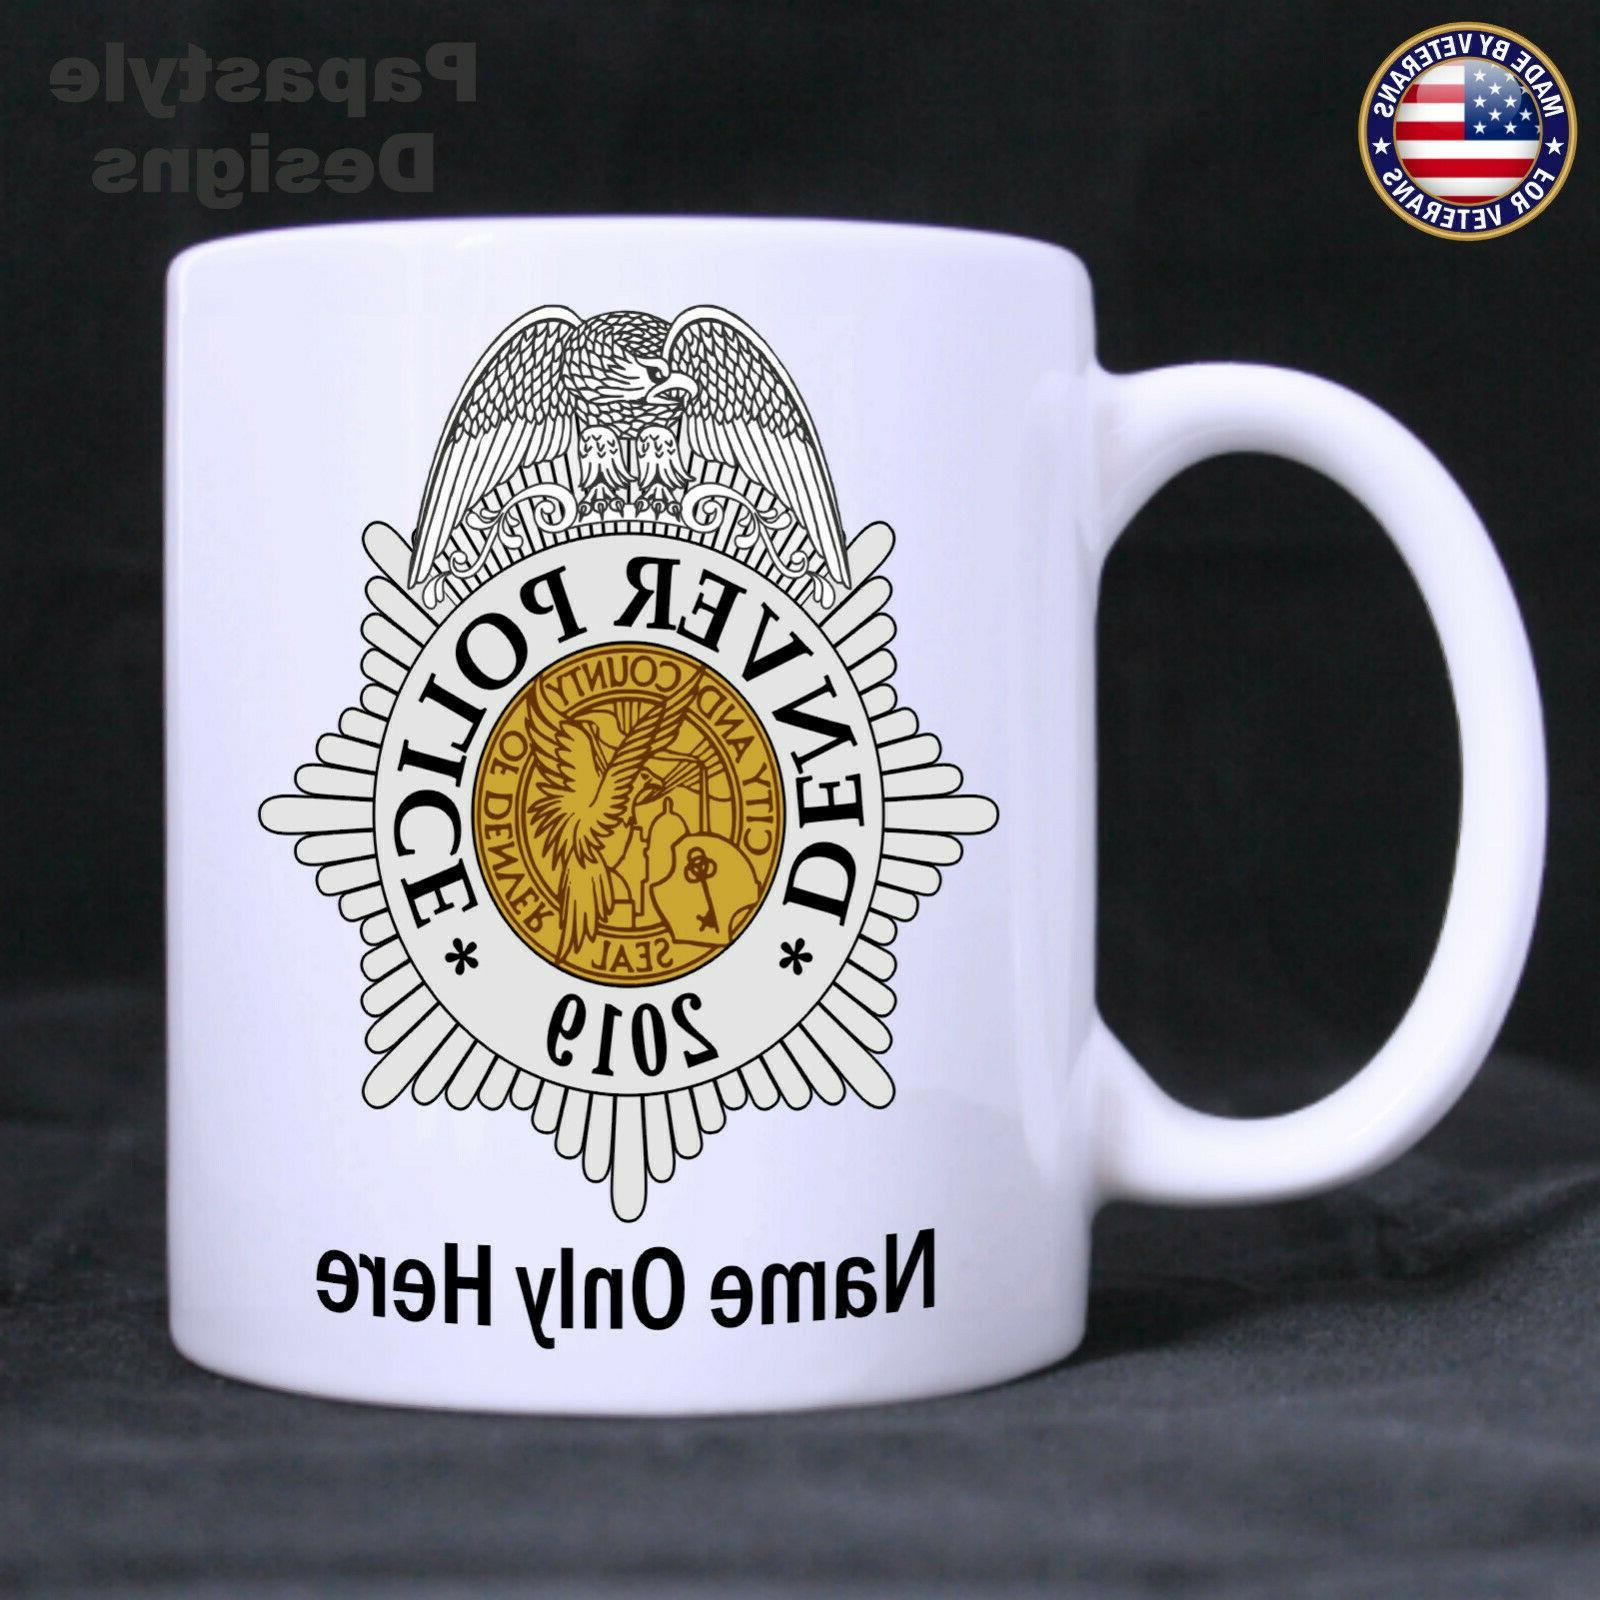 denver police officer personalized 11oz coffee mug